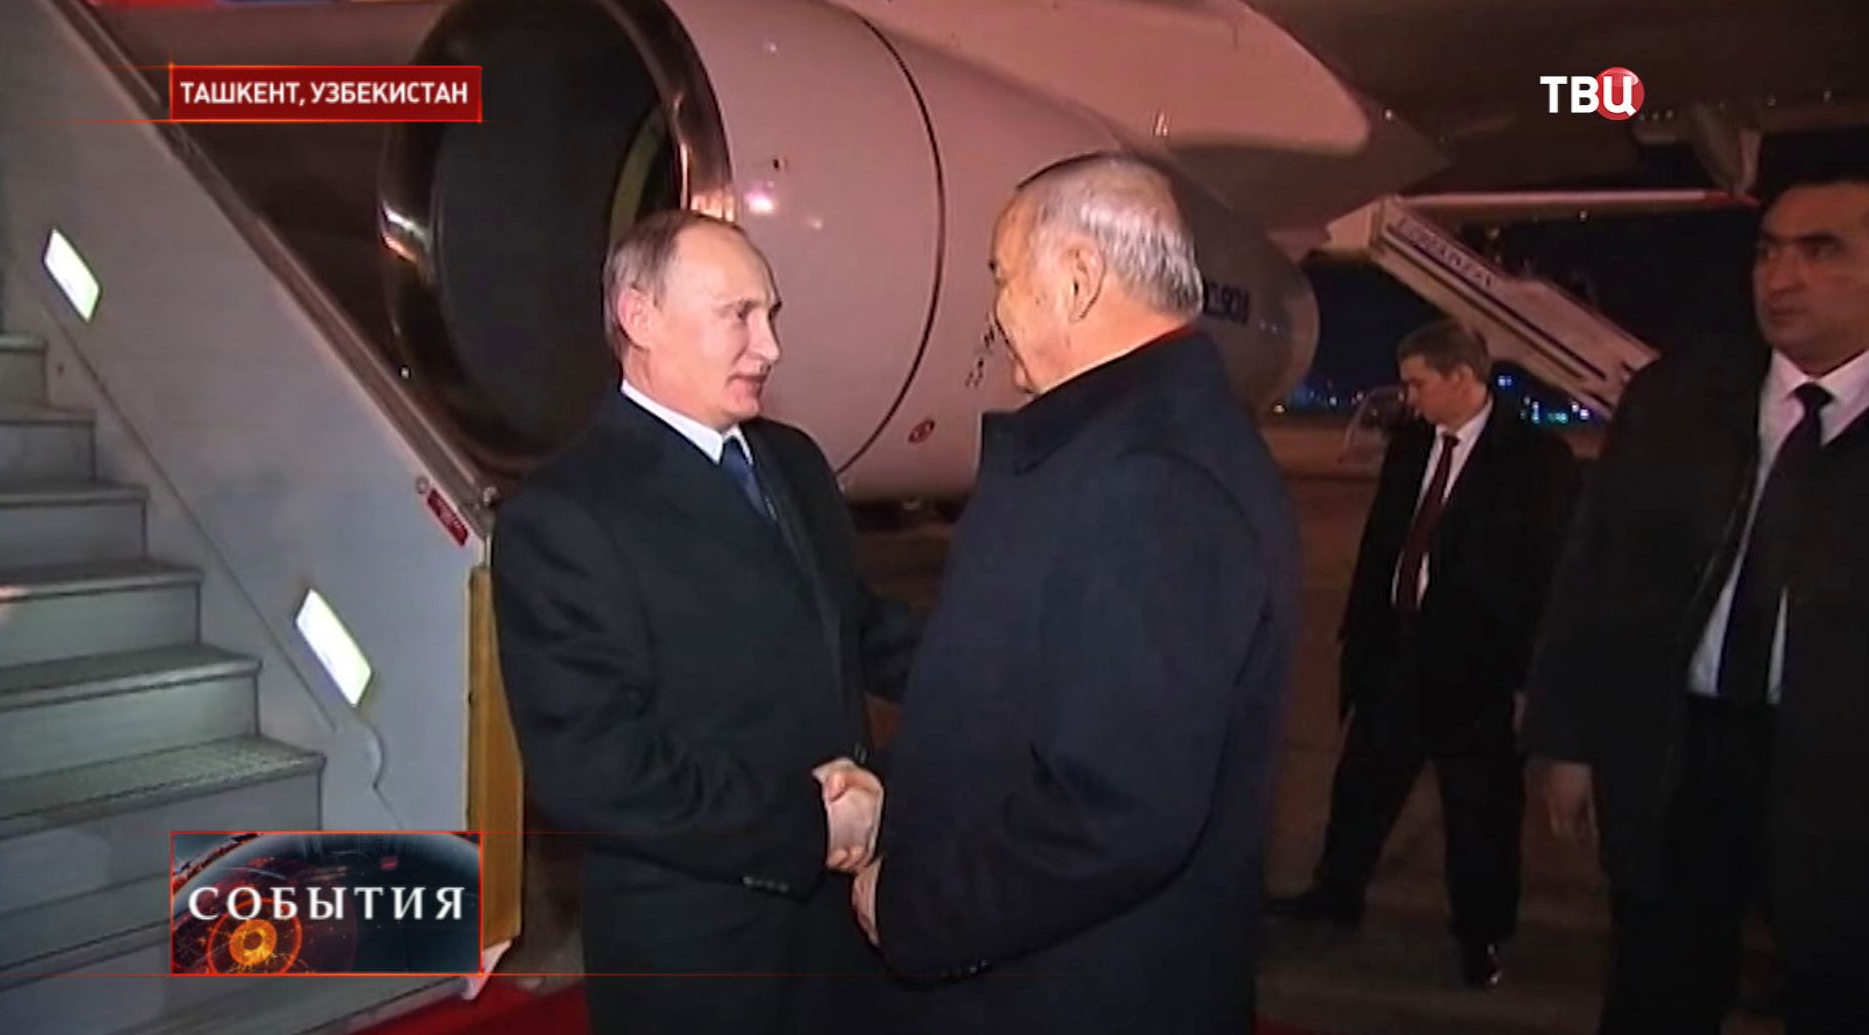 Владимир Путин прибыл в Узбекистан